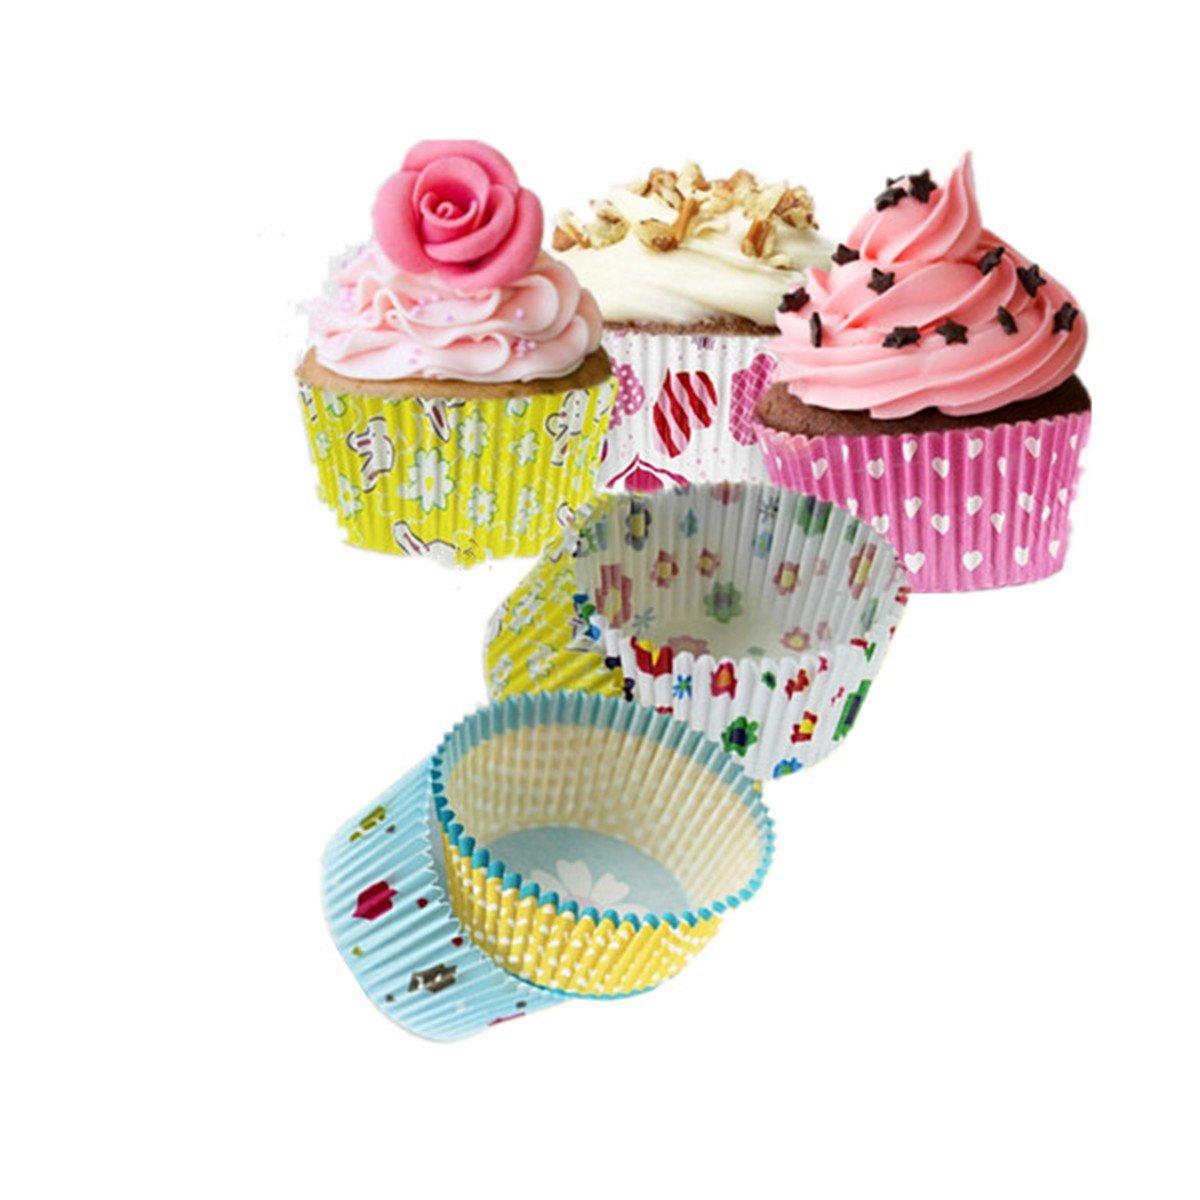 Bruiloft Cupcake Baking Cups-Koop Goedkope Bruiloft Cupcake Baking ...